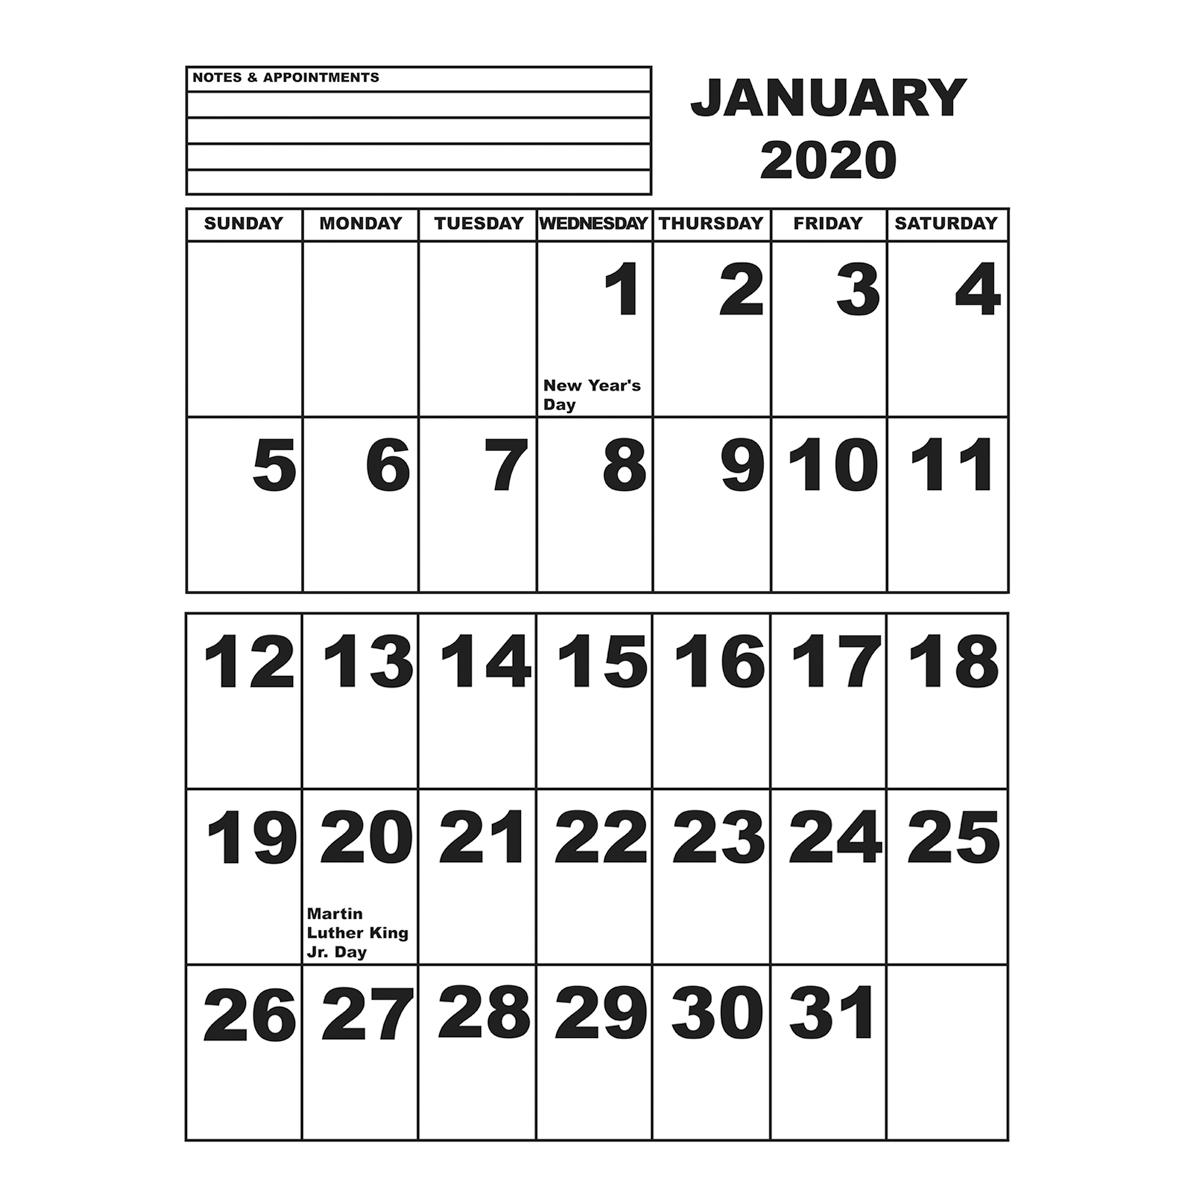 Jumbo Print Calendar - 2020